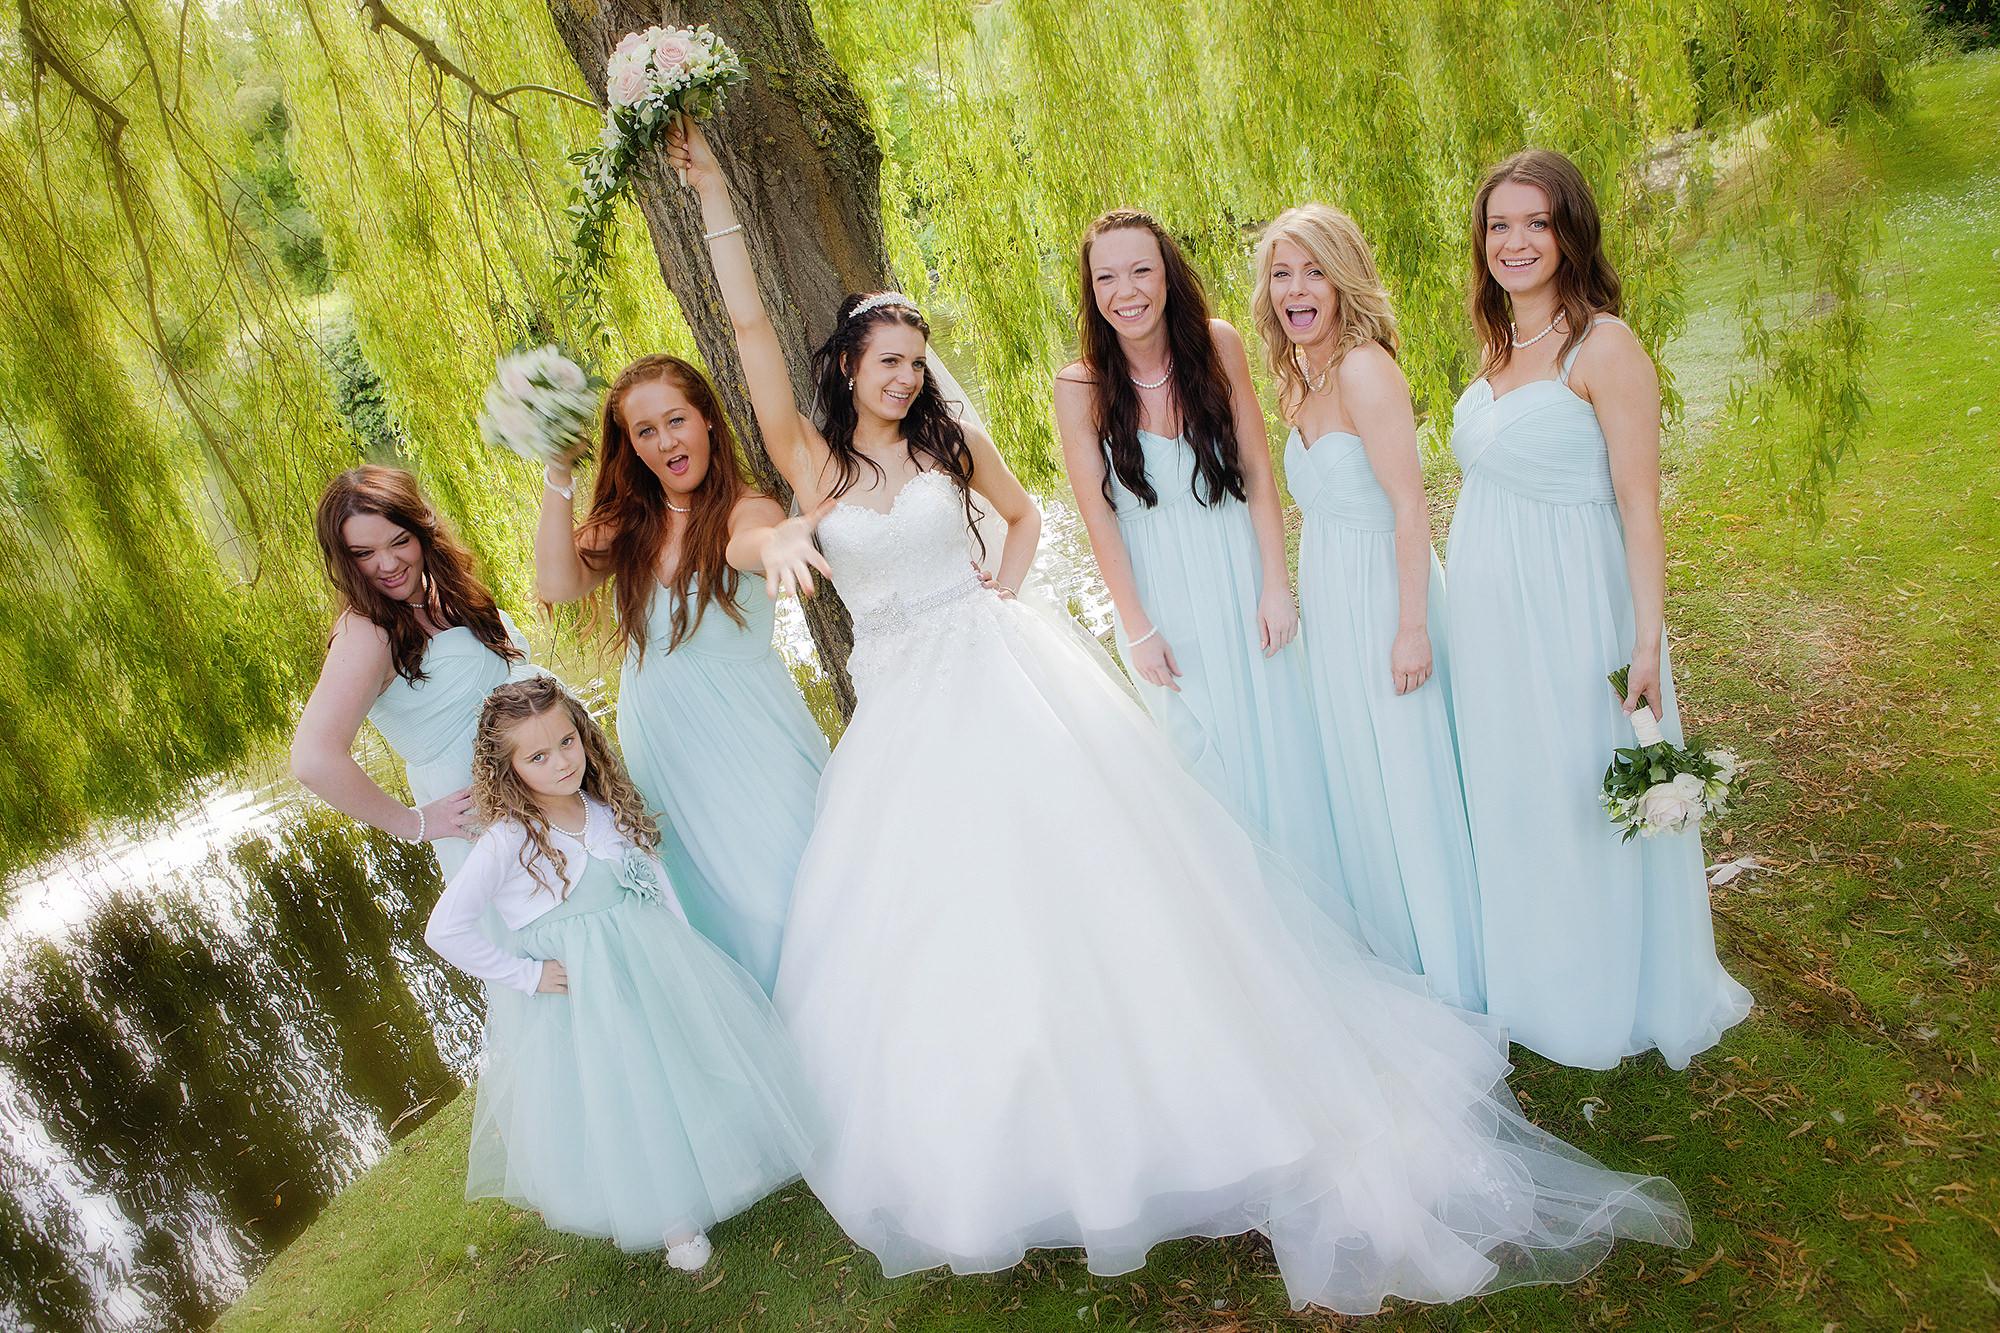 Grange farm wedding photography 11.jpg